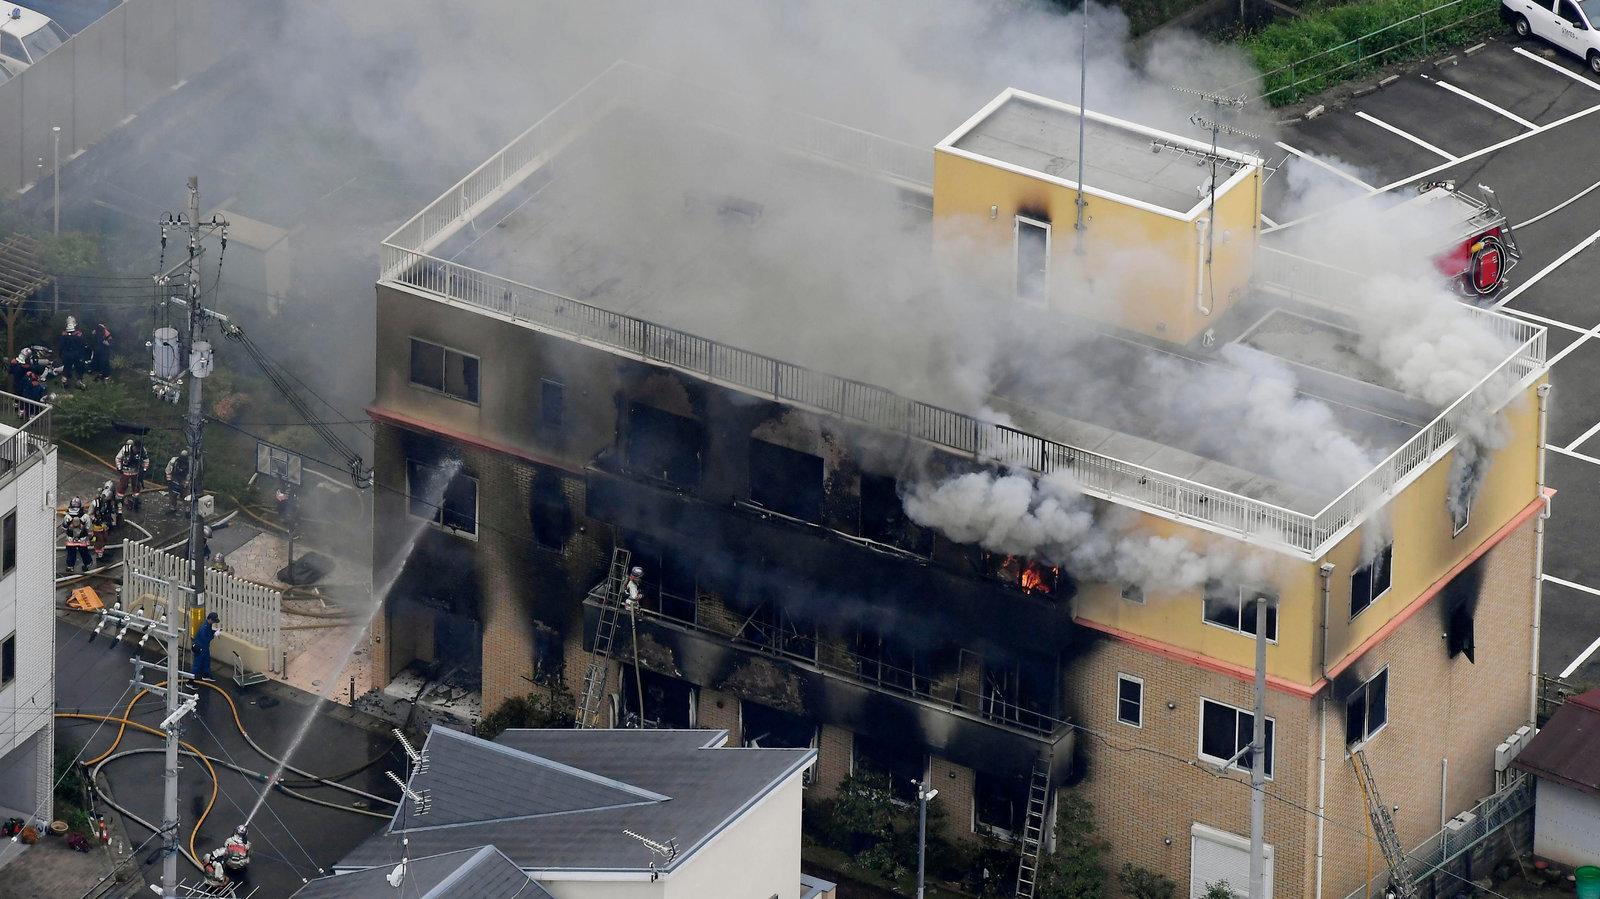 Suspected Arson at Kyoto Animation Studio Kills 33 Shocking Japan 1600x899